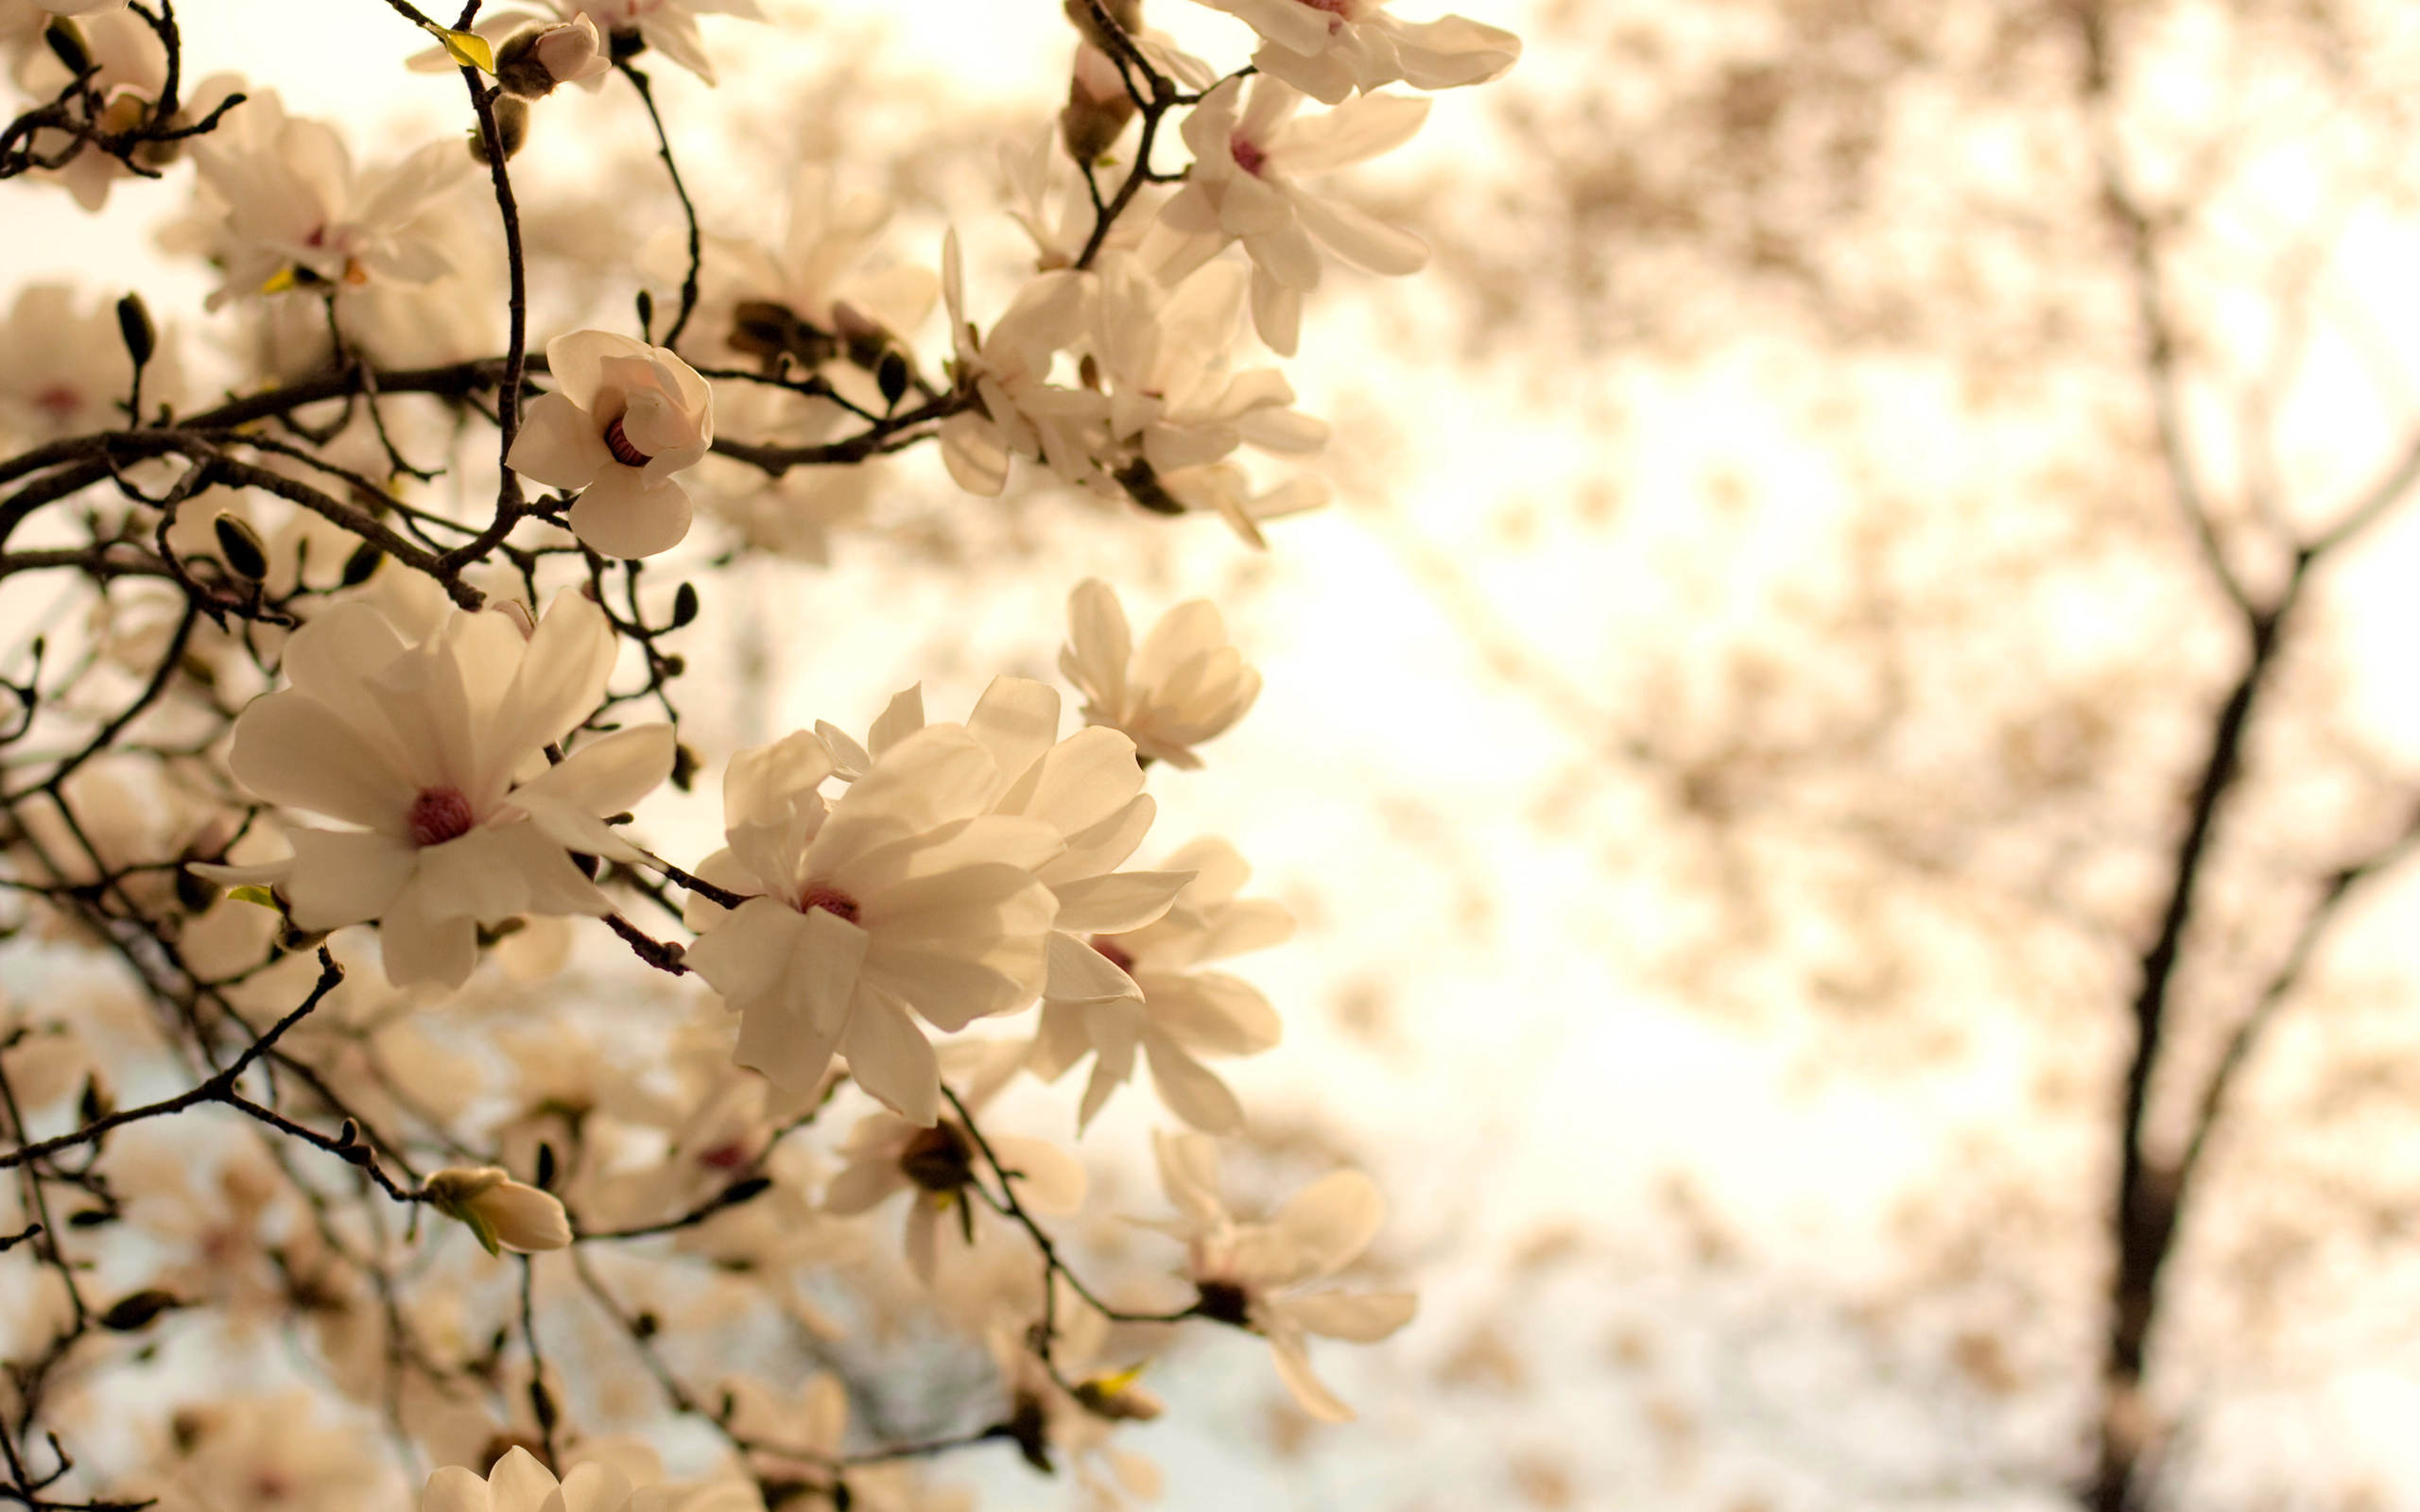 Flowers hd wallpaper background image 2560x1600 id468198 wallpapers id468198 mightylinksfo